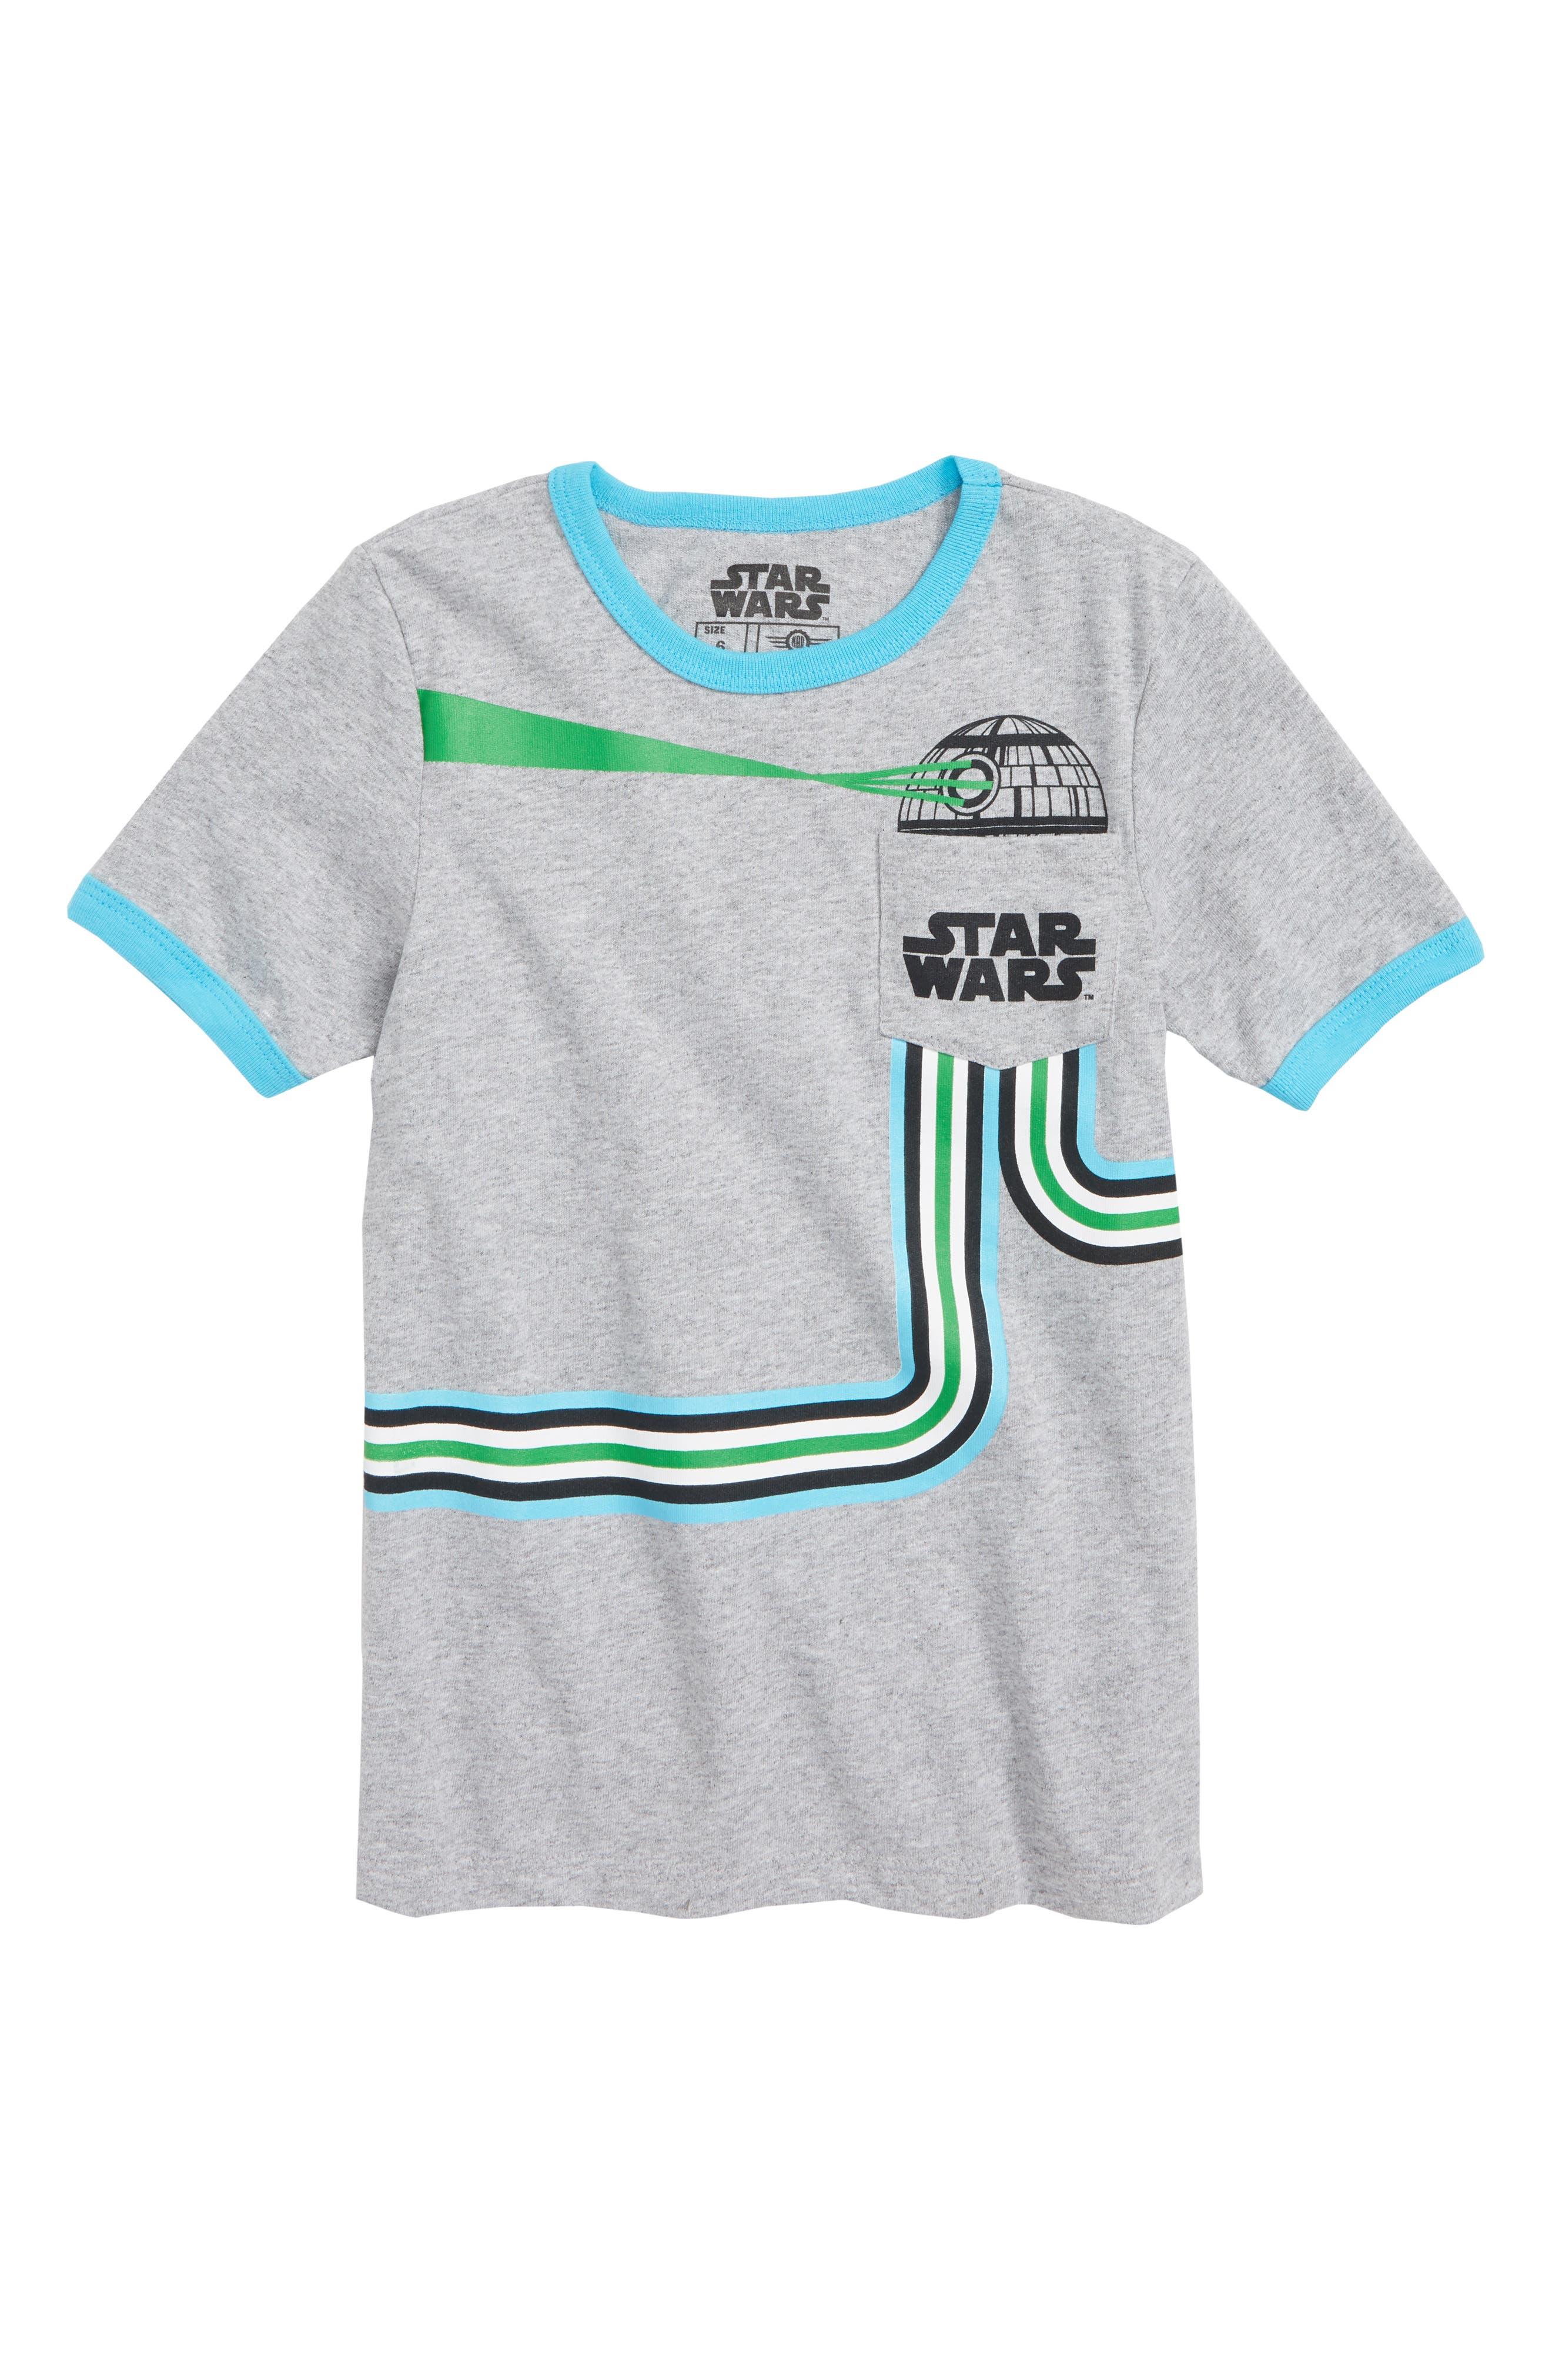 Star Wars Death Star Pocket T-Shirt,                             Main thumbnail 1, color,                             HEATHER GREY/ LIGHT BLUE